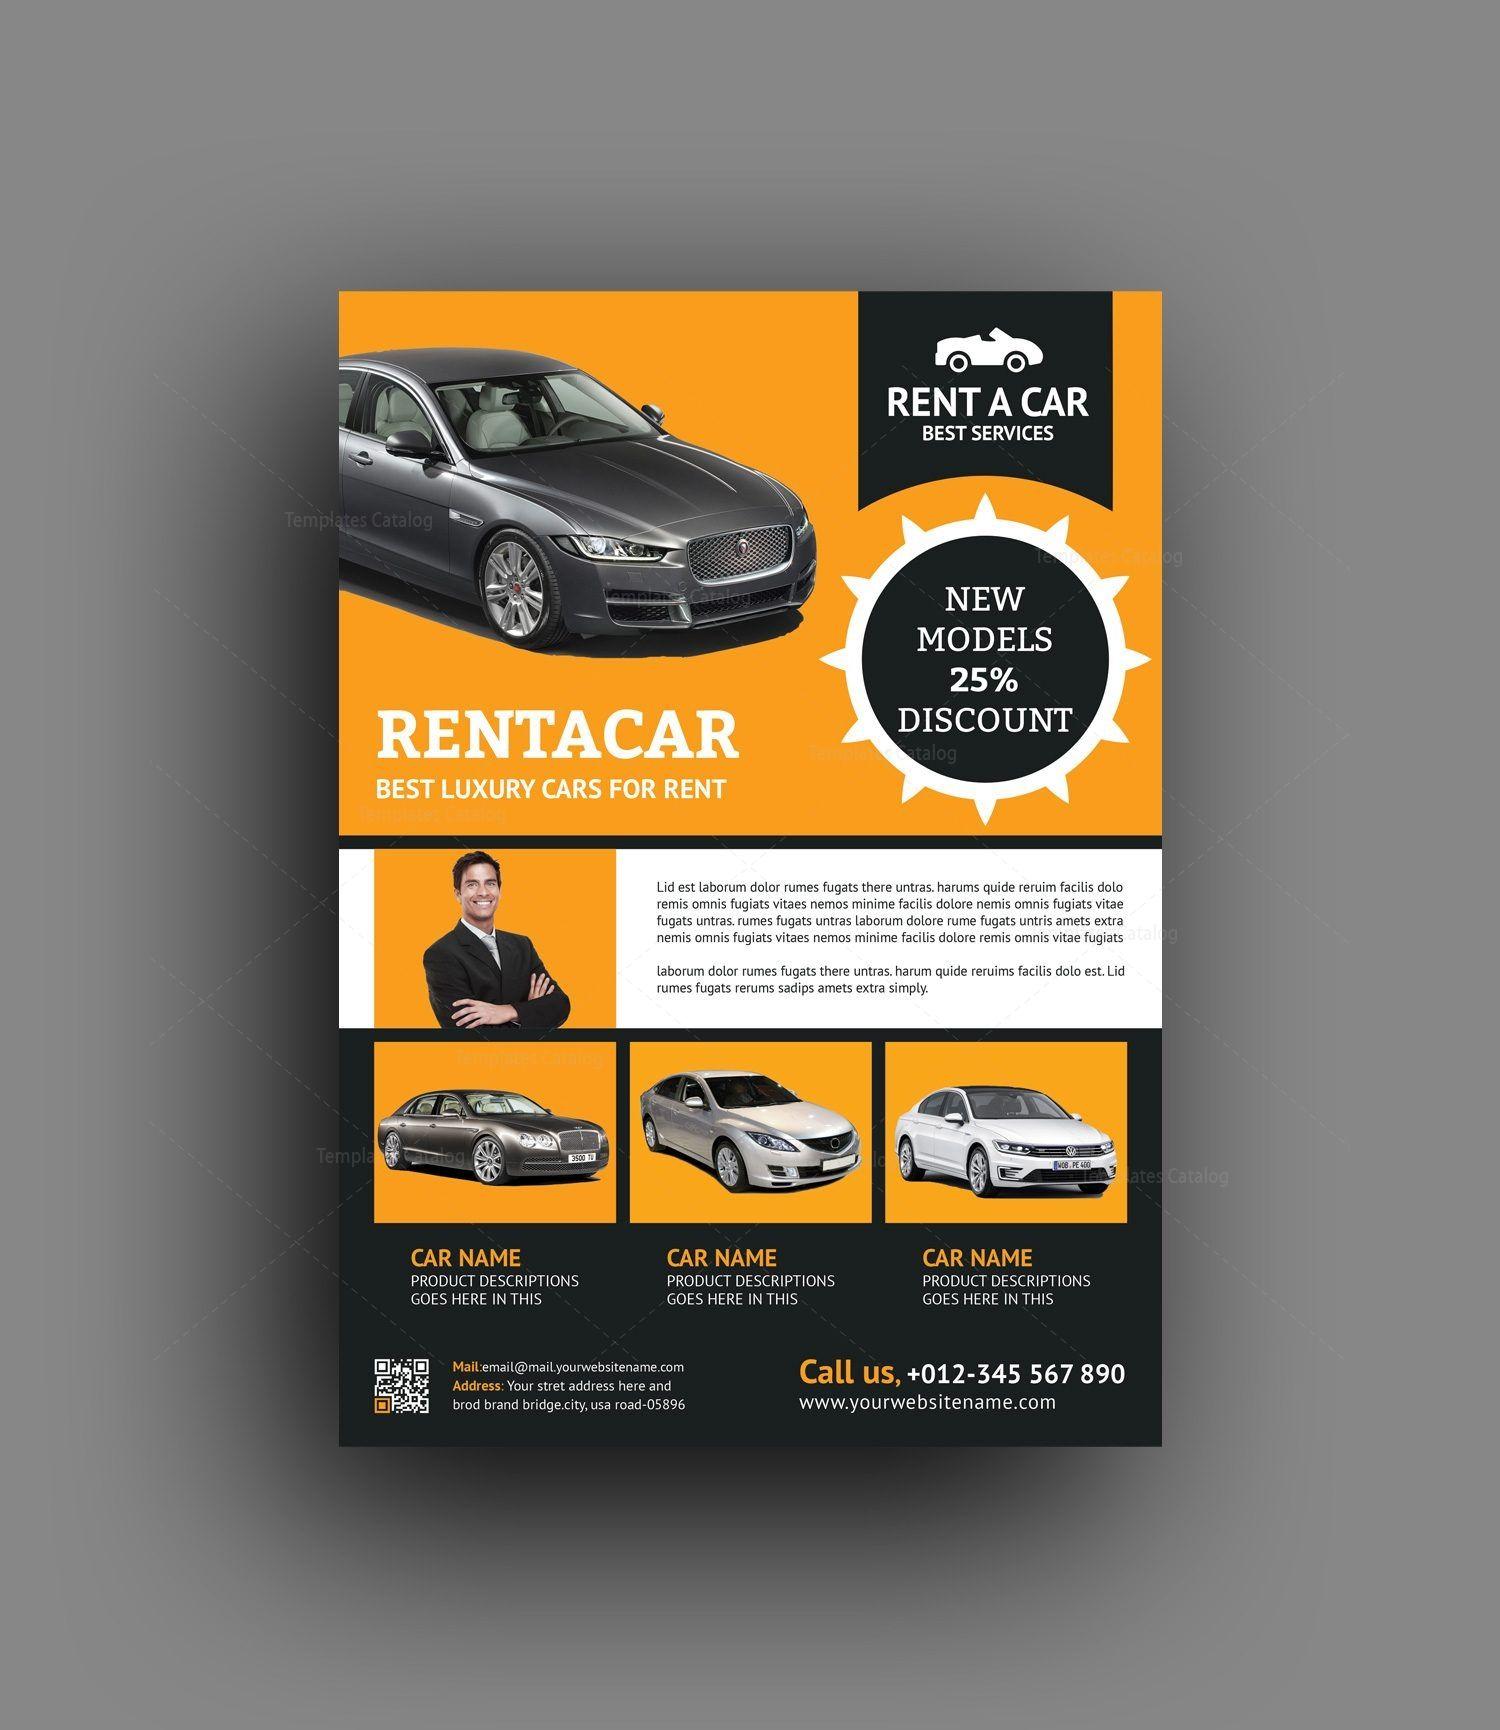 Rent a Car Flyer Design Template Flyer design templates